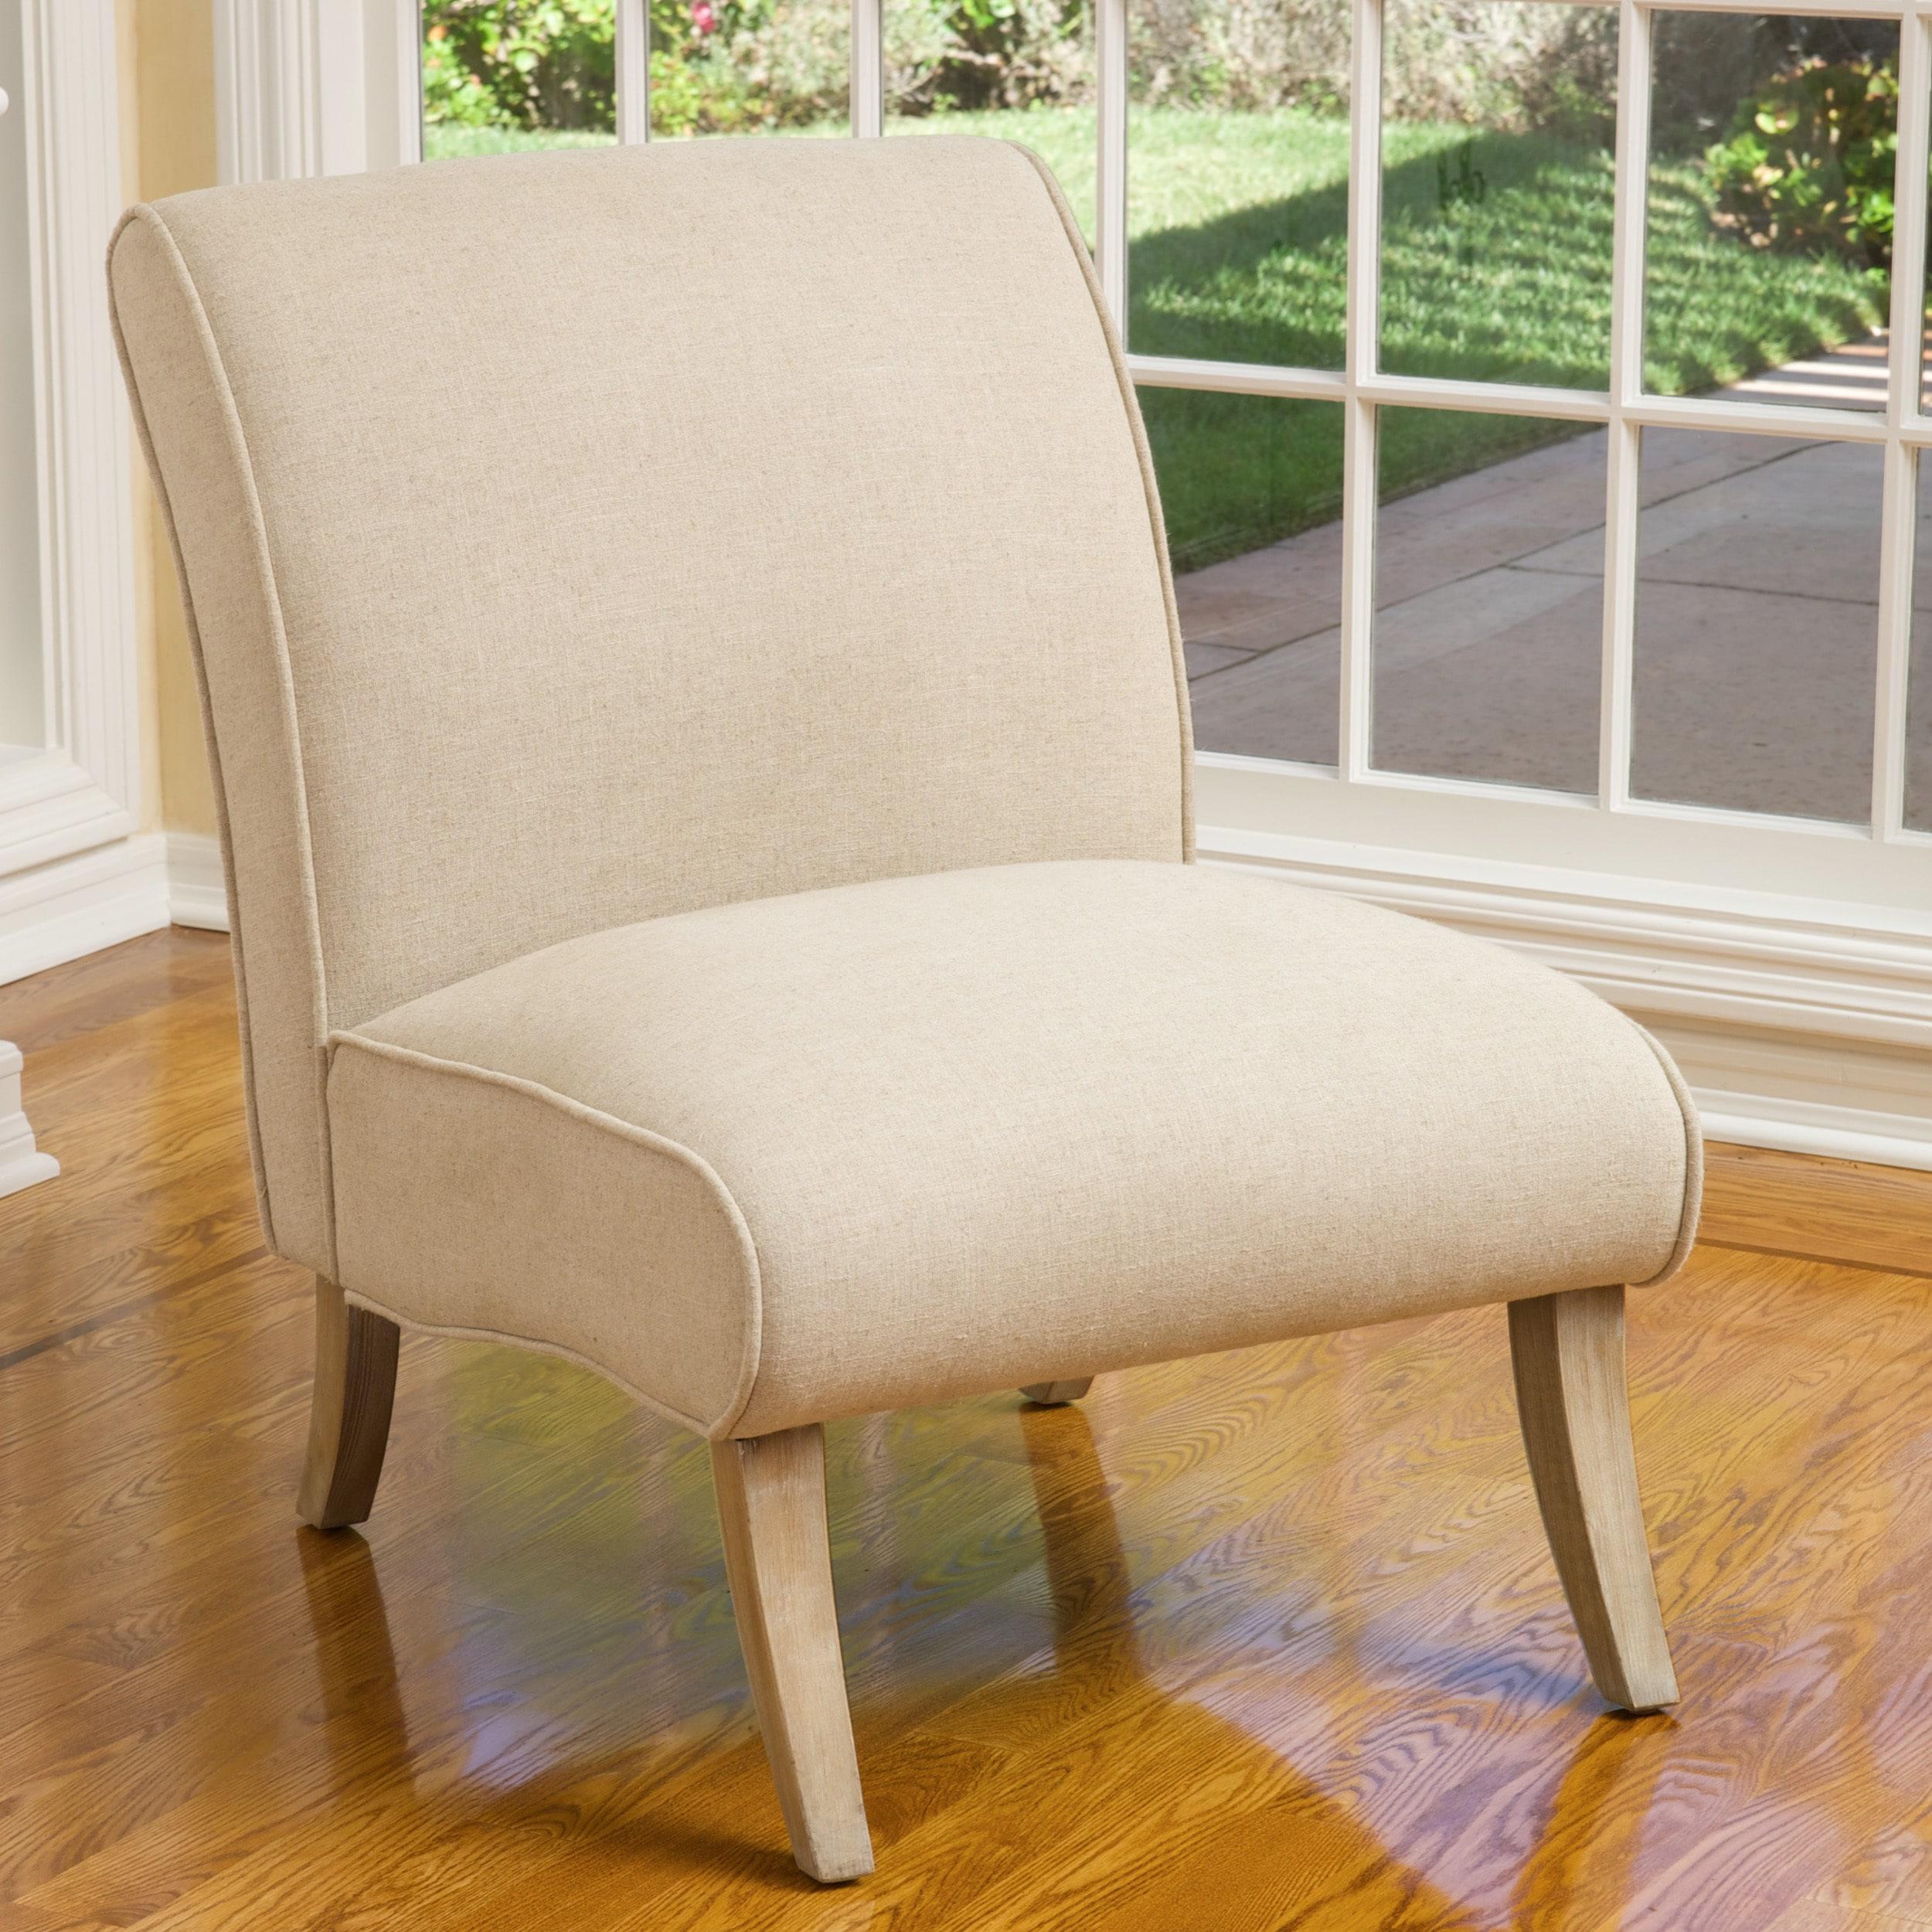 Geor te Beige Linen Slipper Chair by Christopher Knight Home